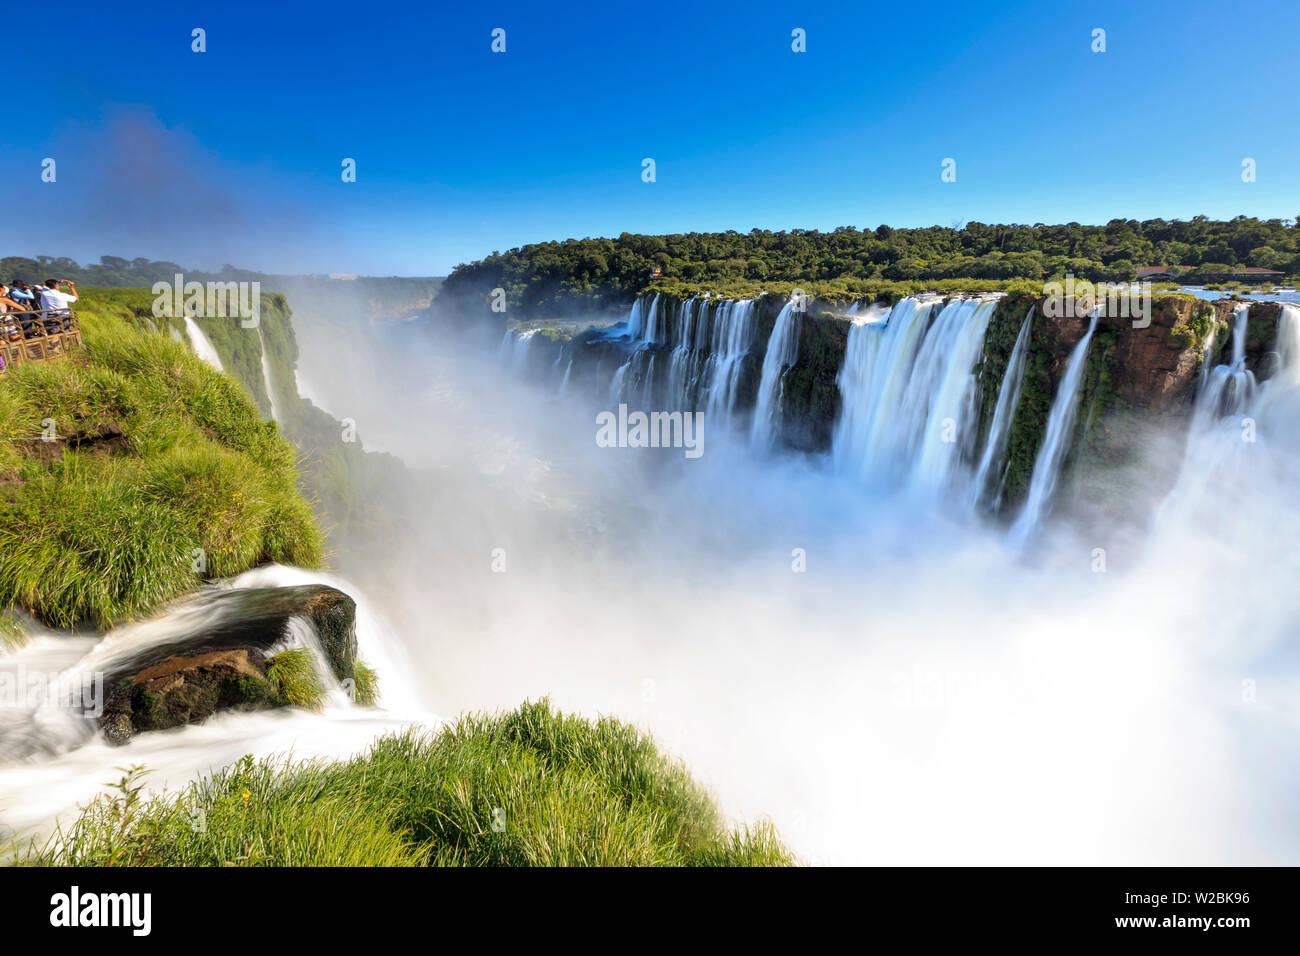 Argentina, Iguazu Falls National Park, (UNESCO Site), Devil's Throat - Stock Image